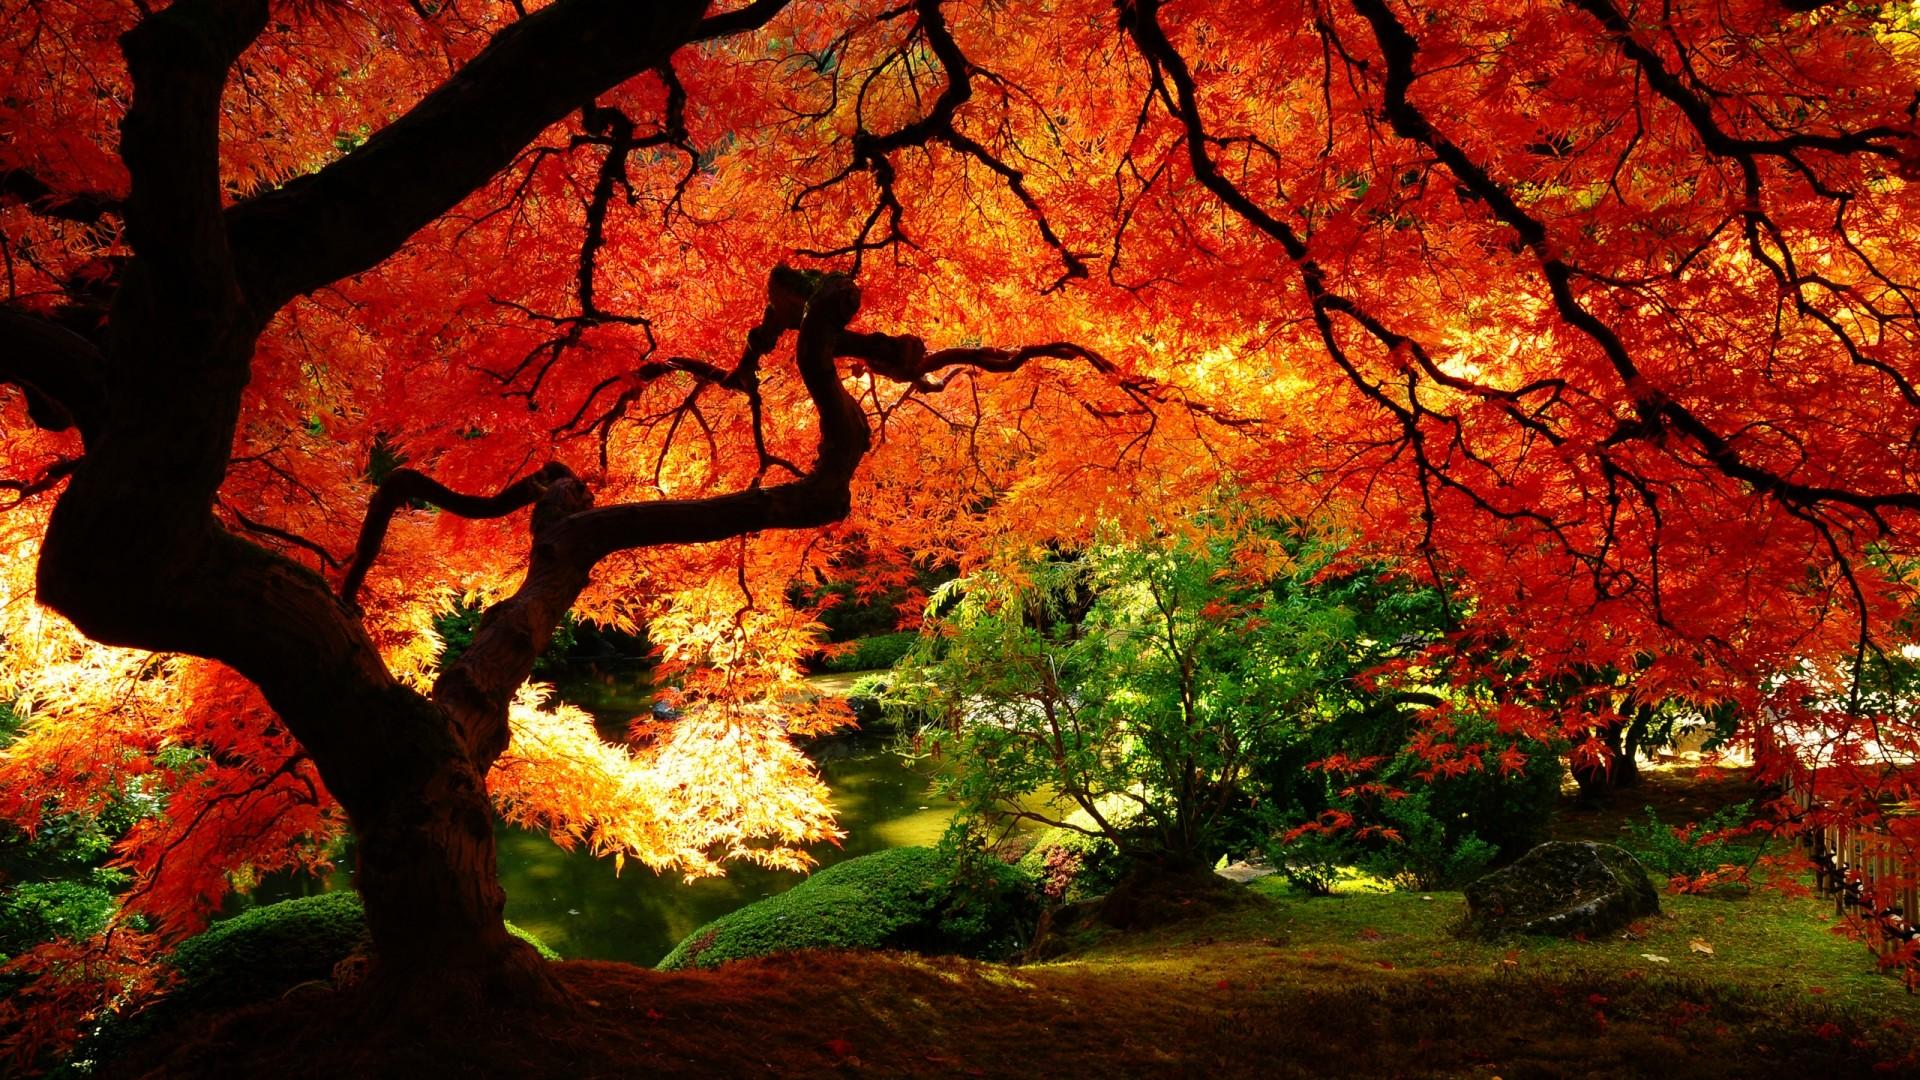 Fall Season Wallpaper for Desktop   Desktop Image